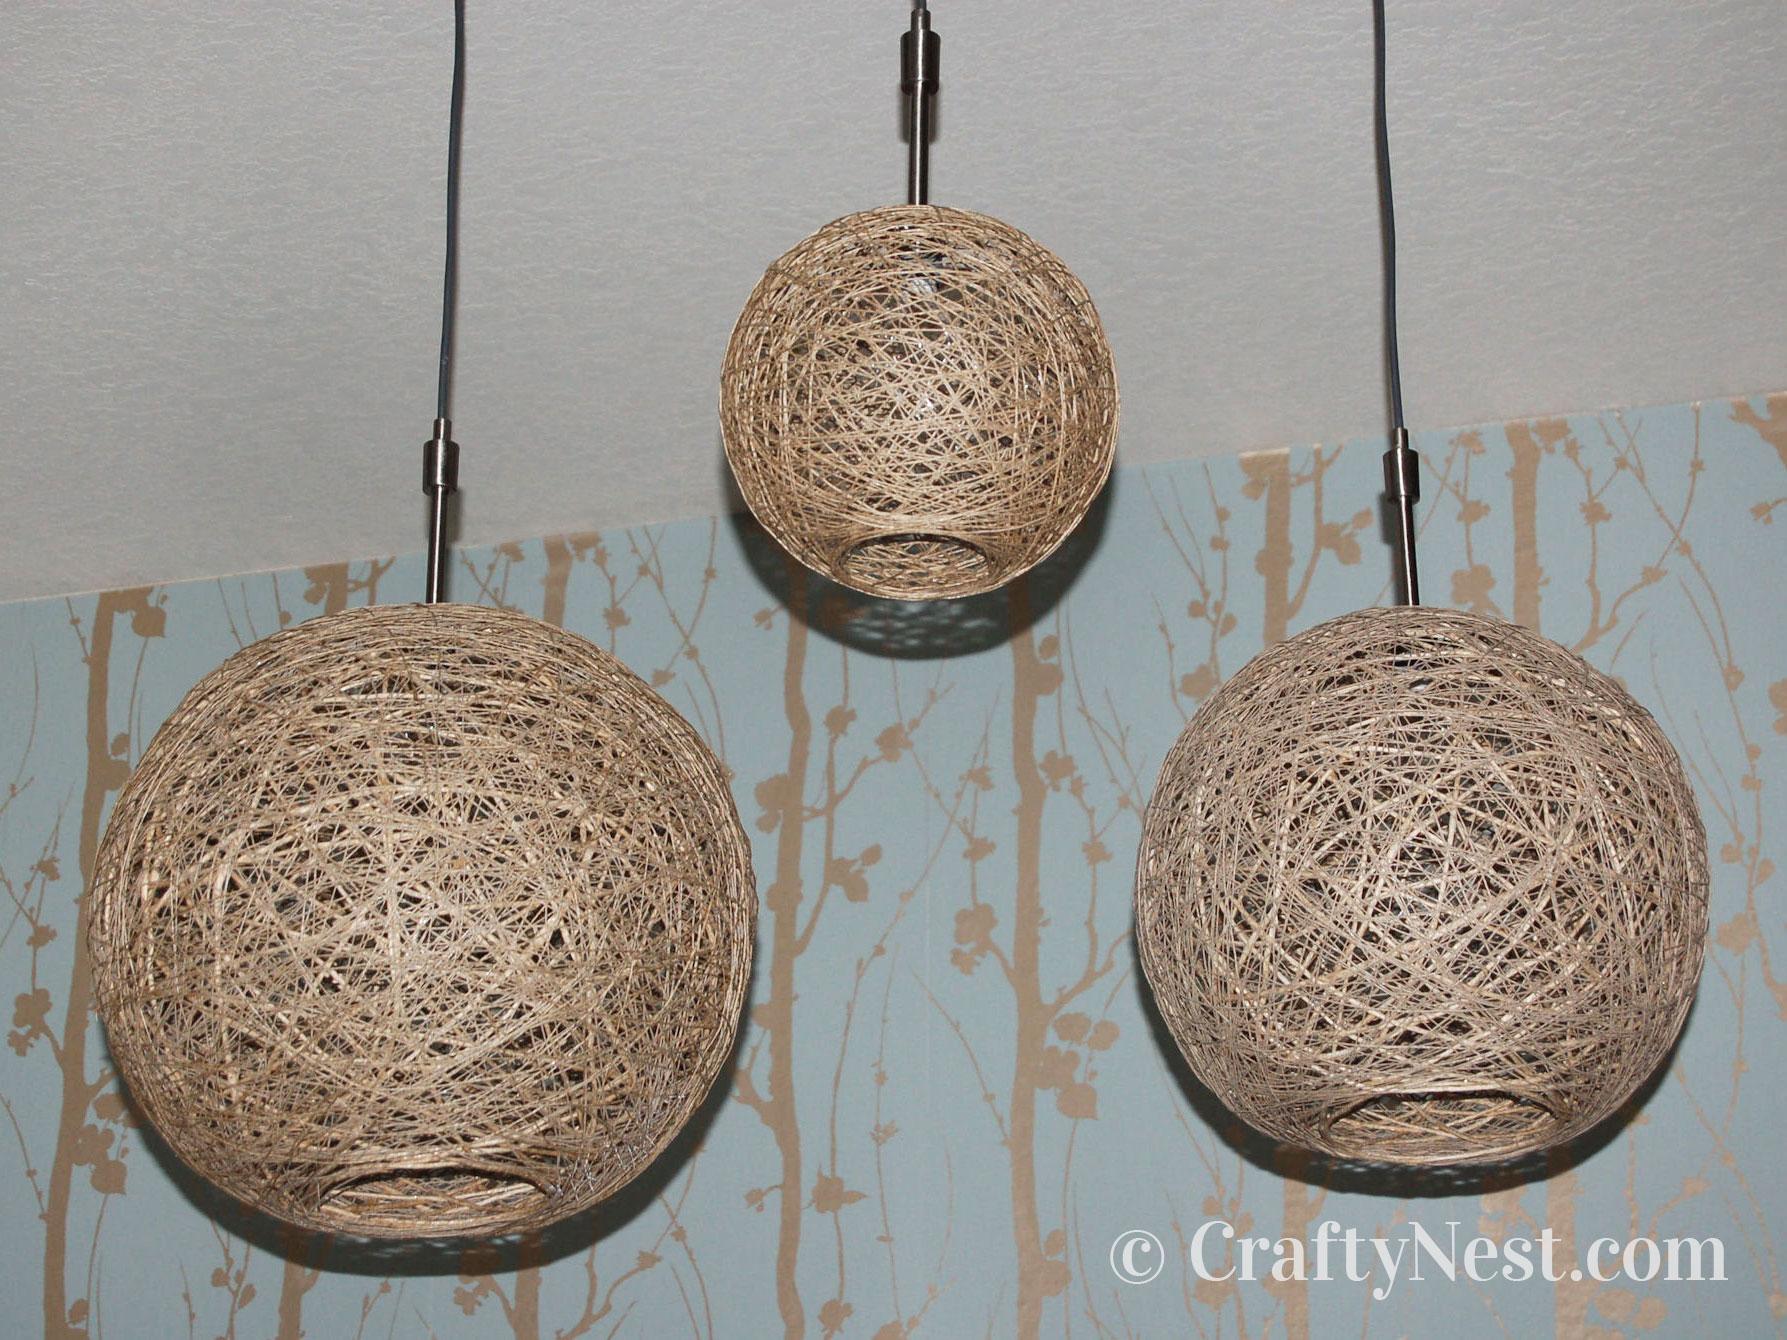 Three handmade hemp string pendant lamps, photo